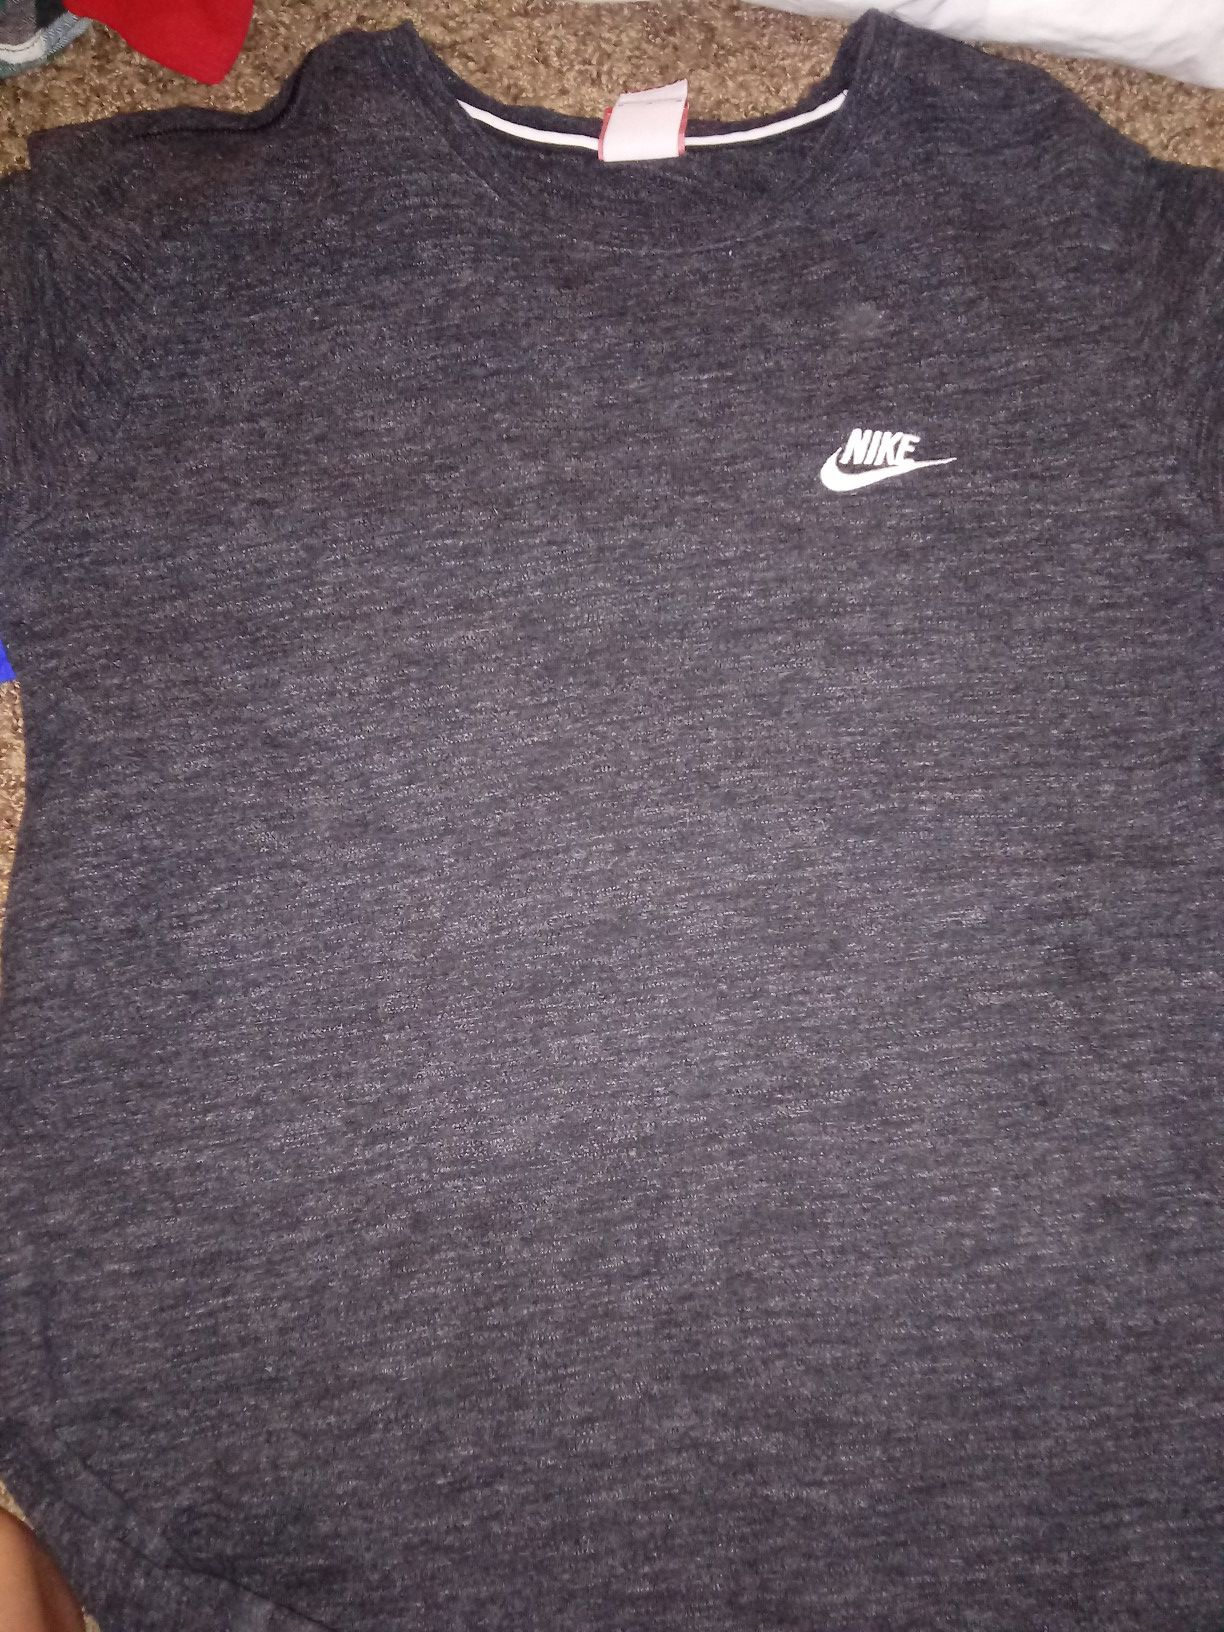 3 men's Nike shirts size MEDIUMS